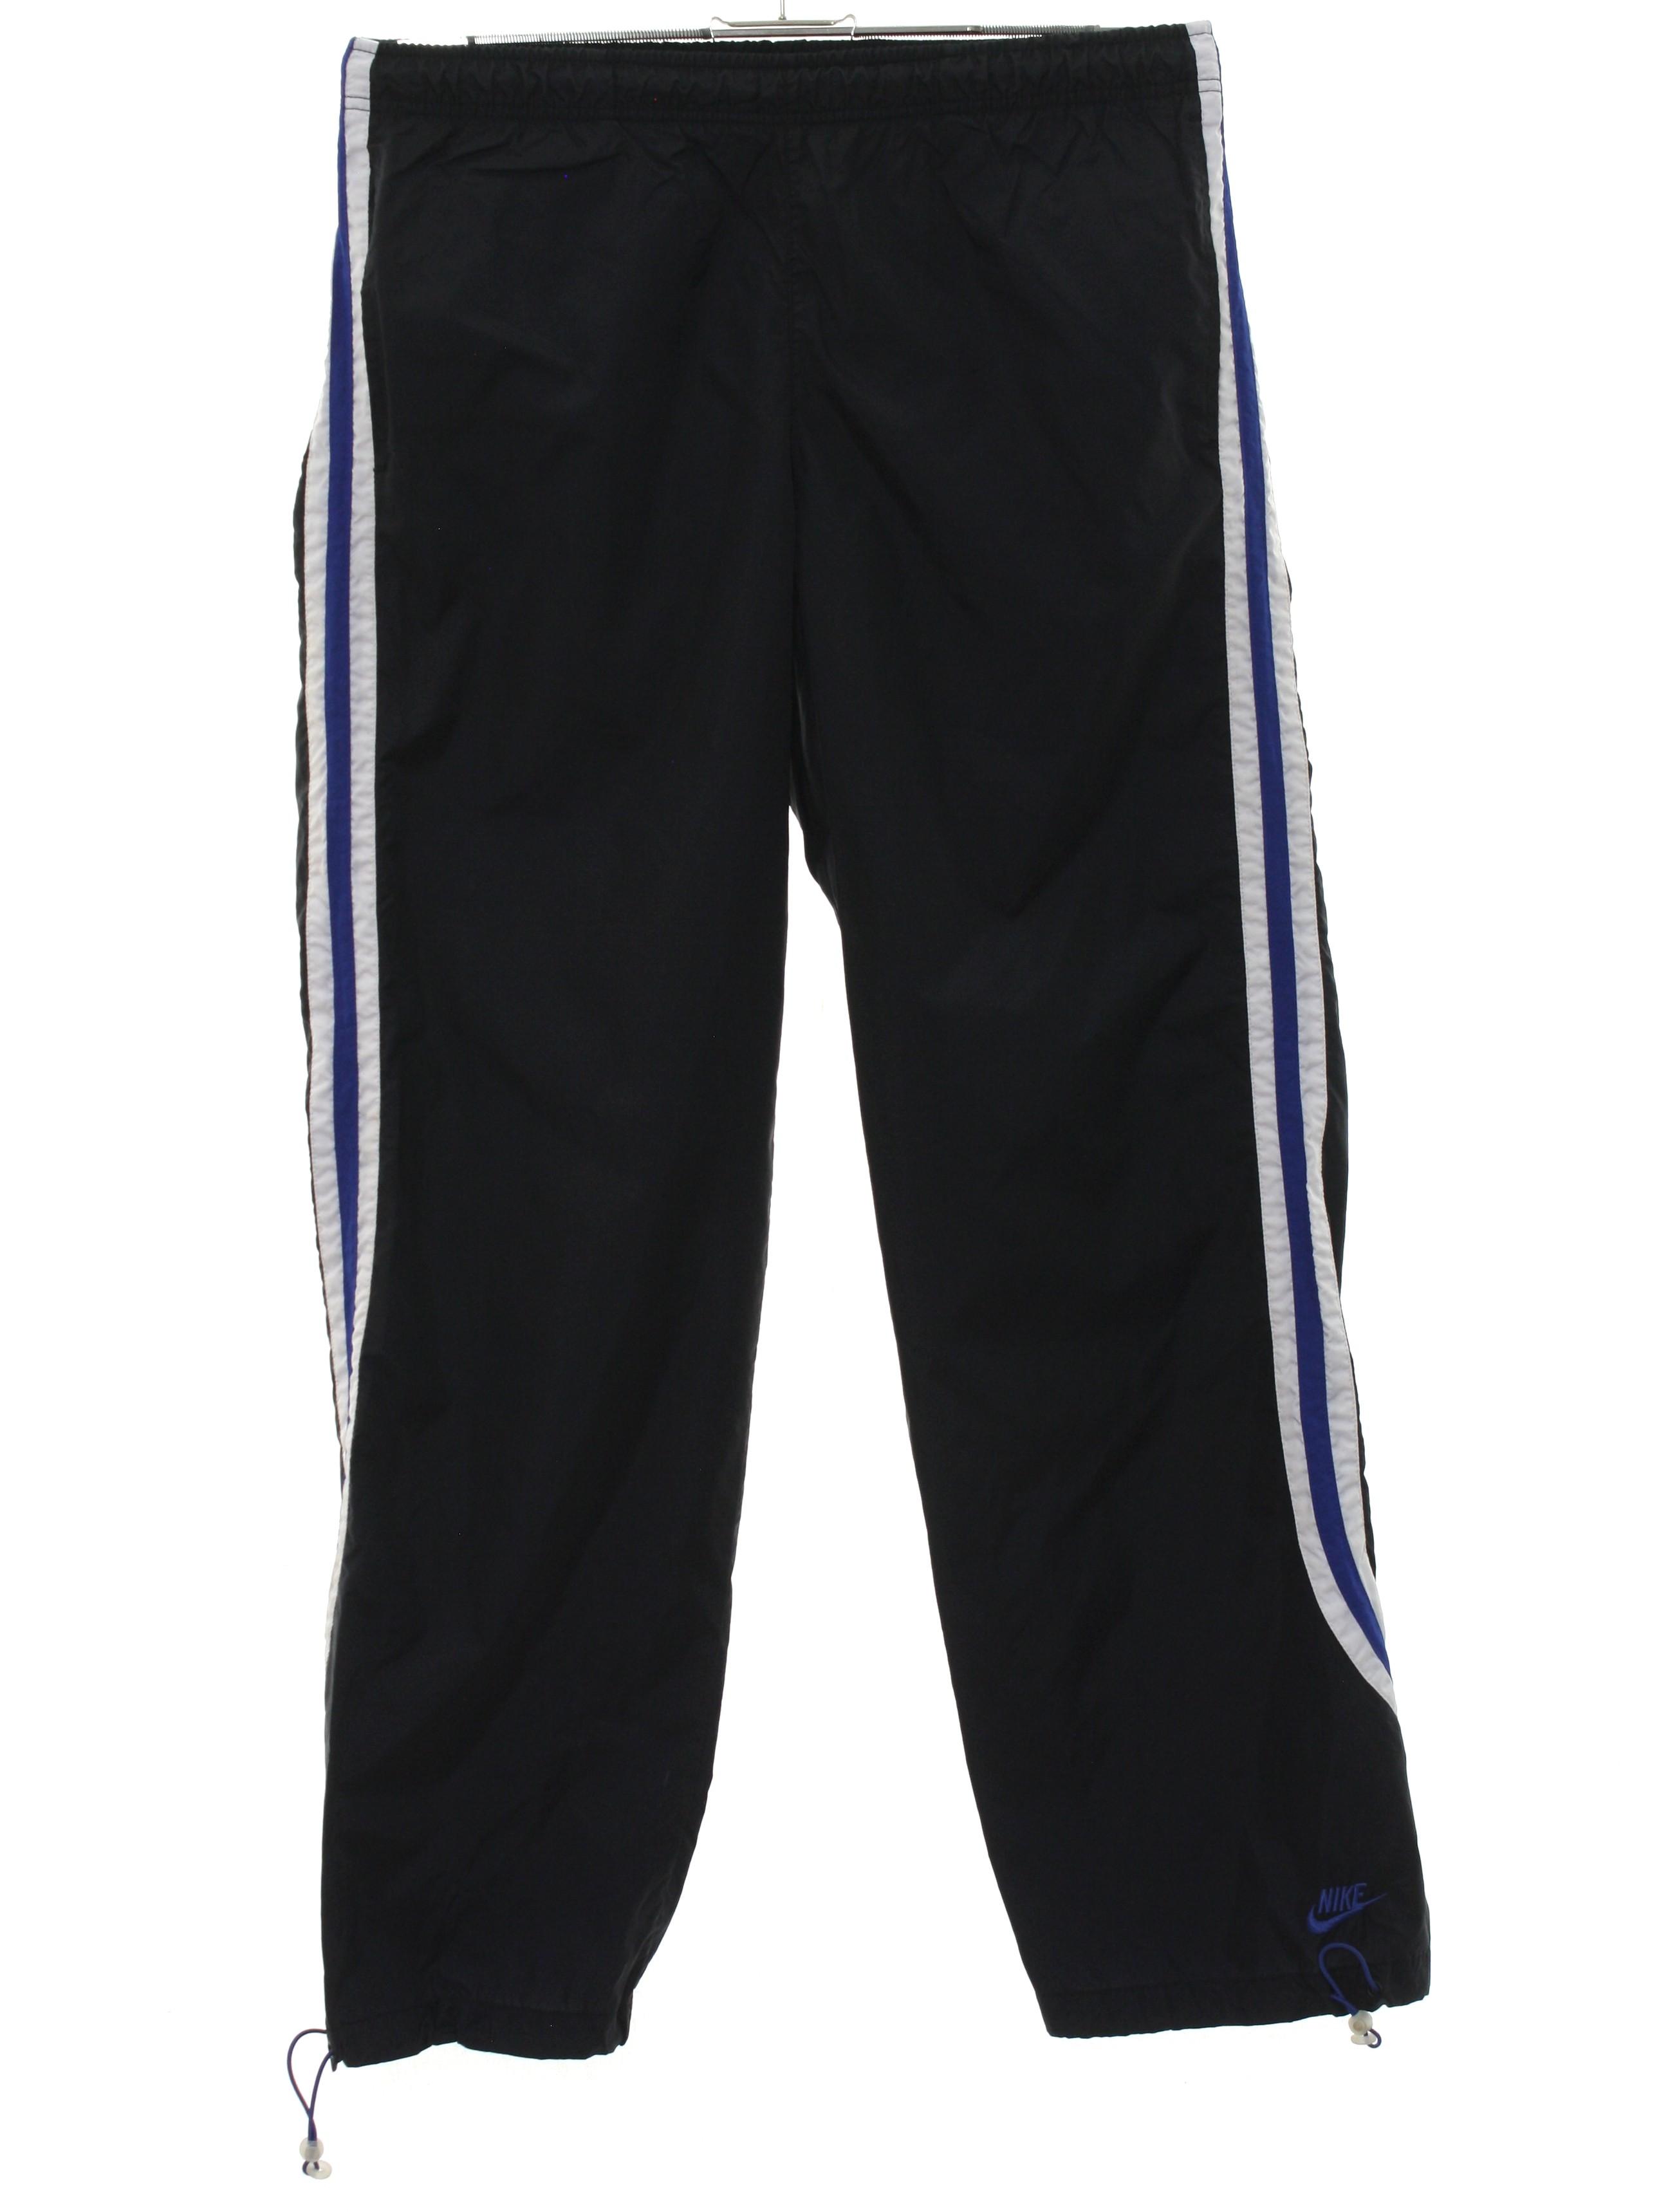 d86f525d005d5 1990's Nike Mens Baggy Track Pants $18.00 Not in stock. Item No. 342112